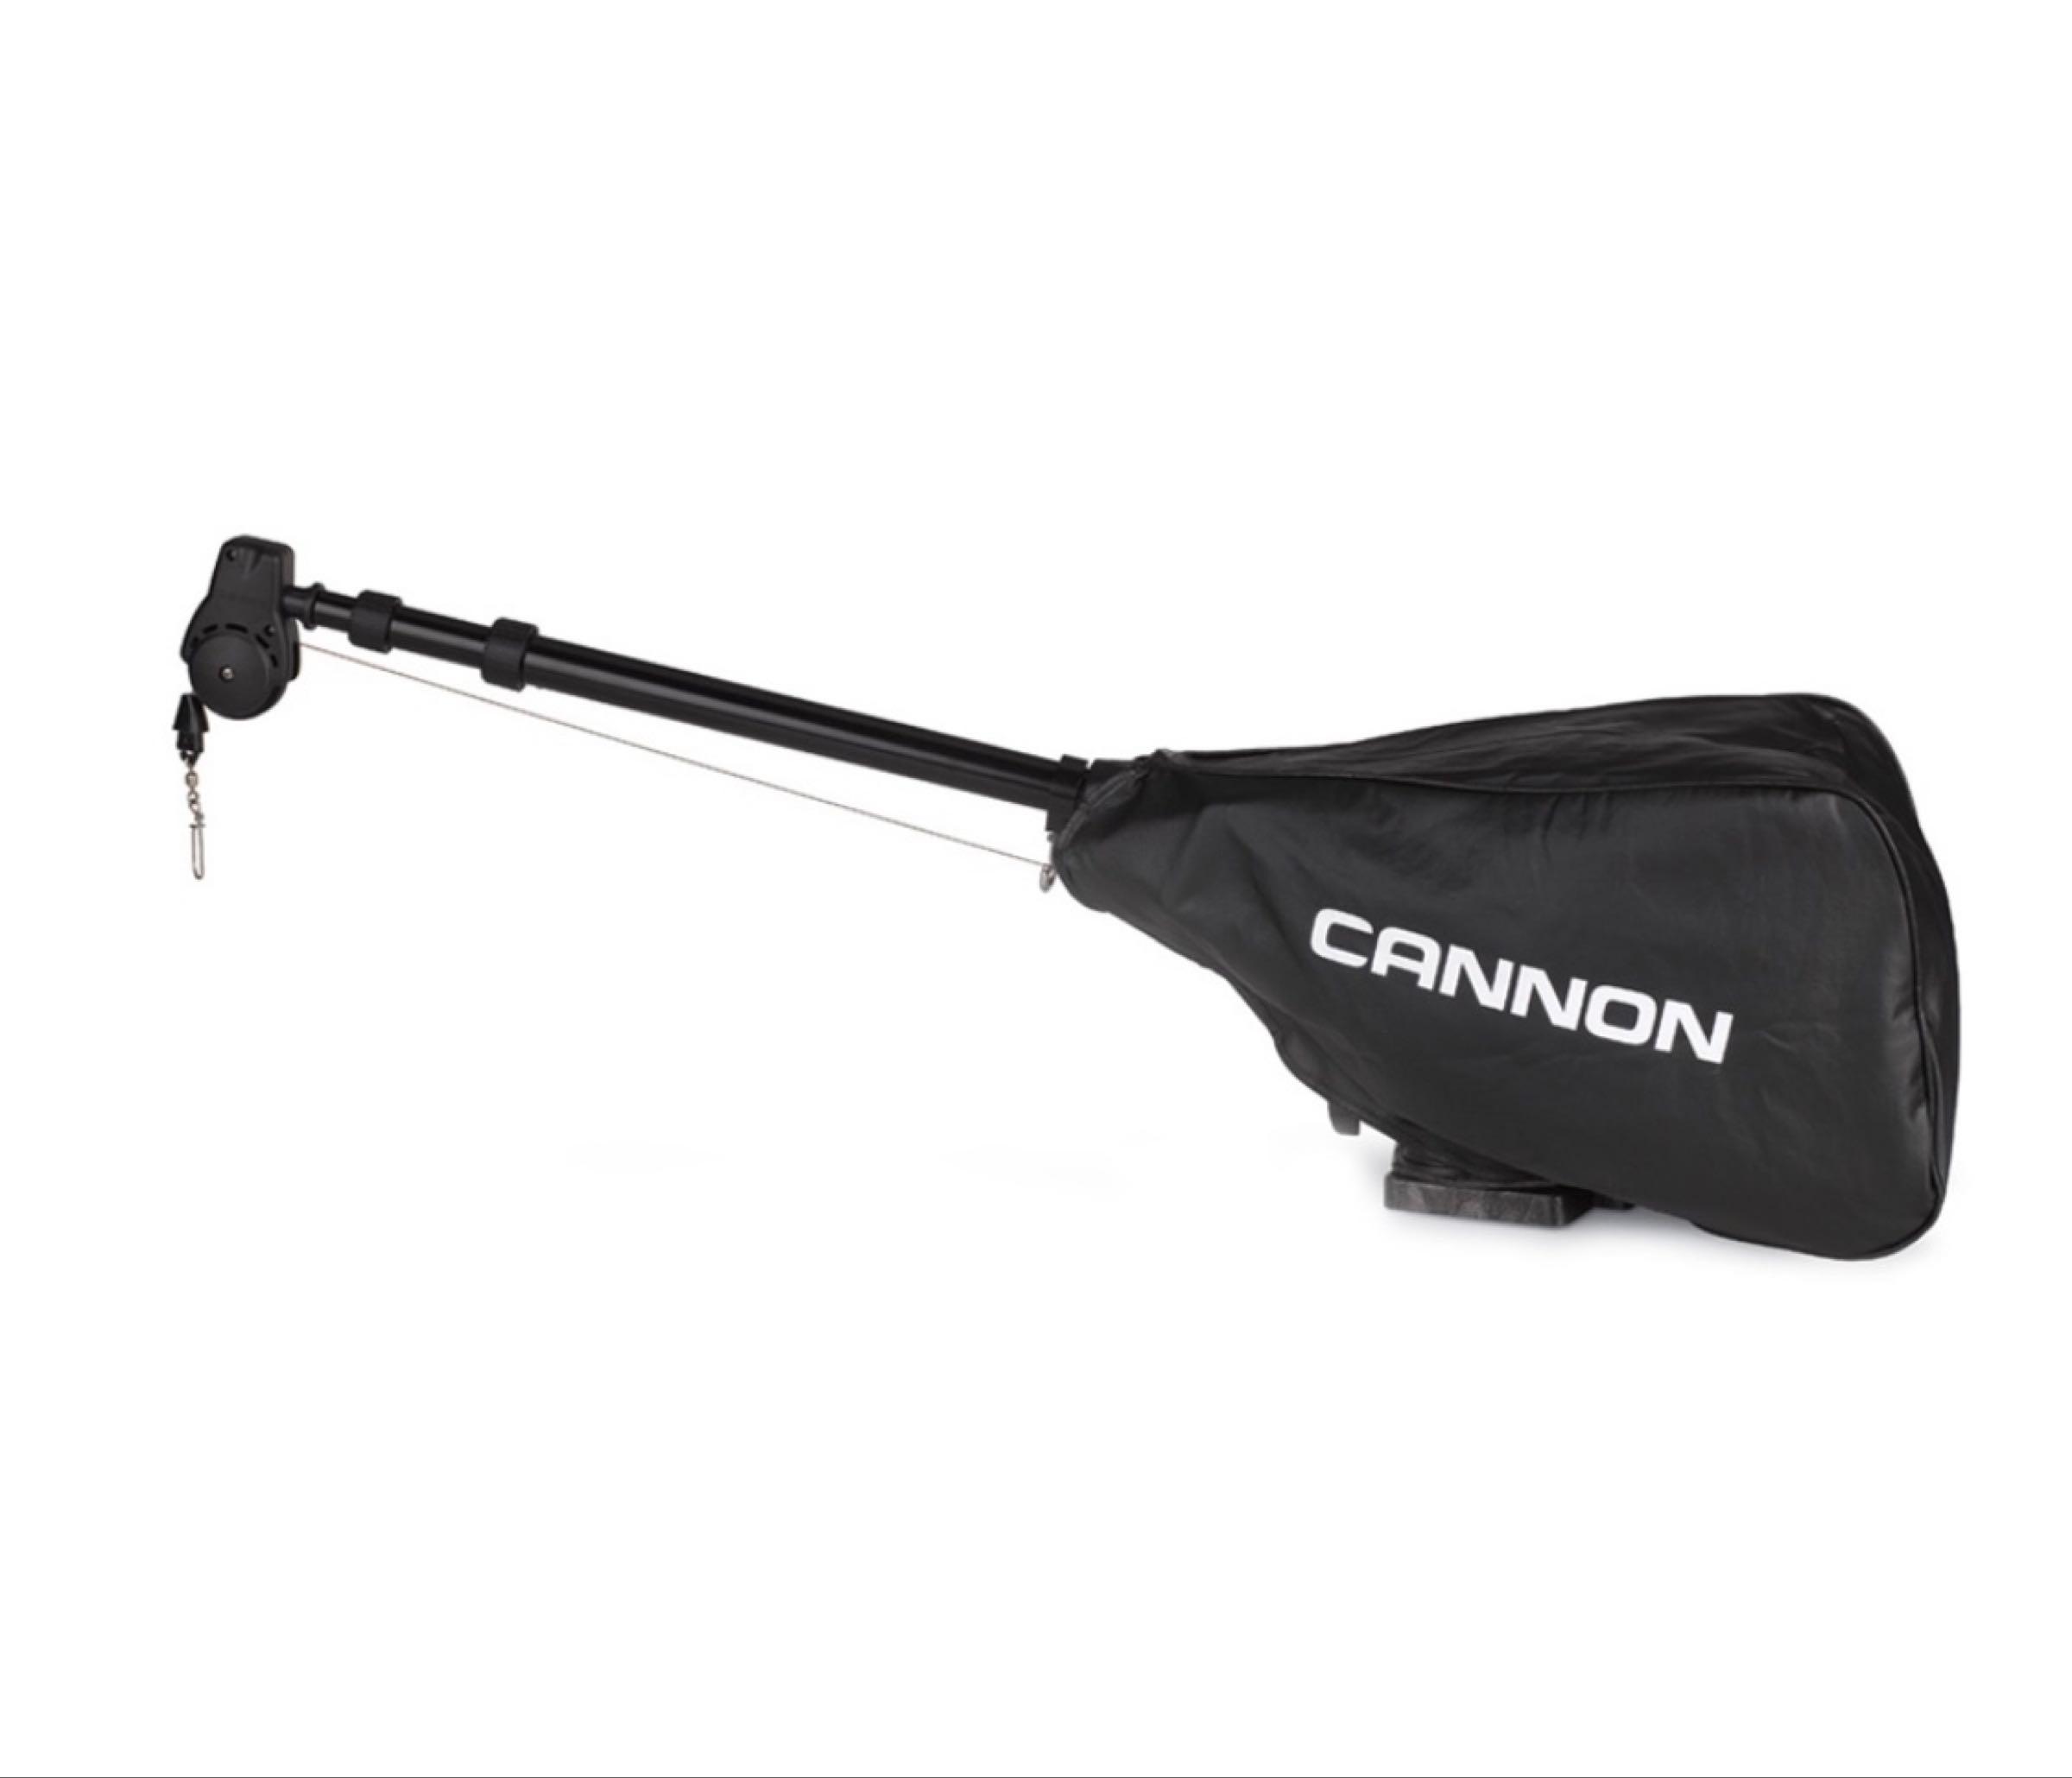 Cannon Downriggertrekk, svart